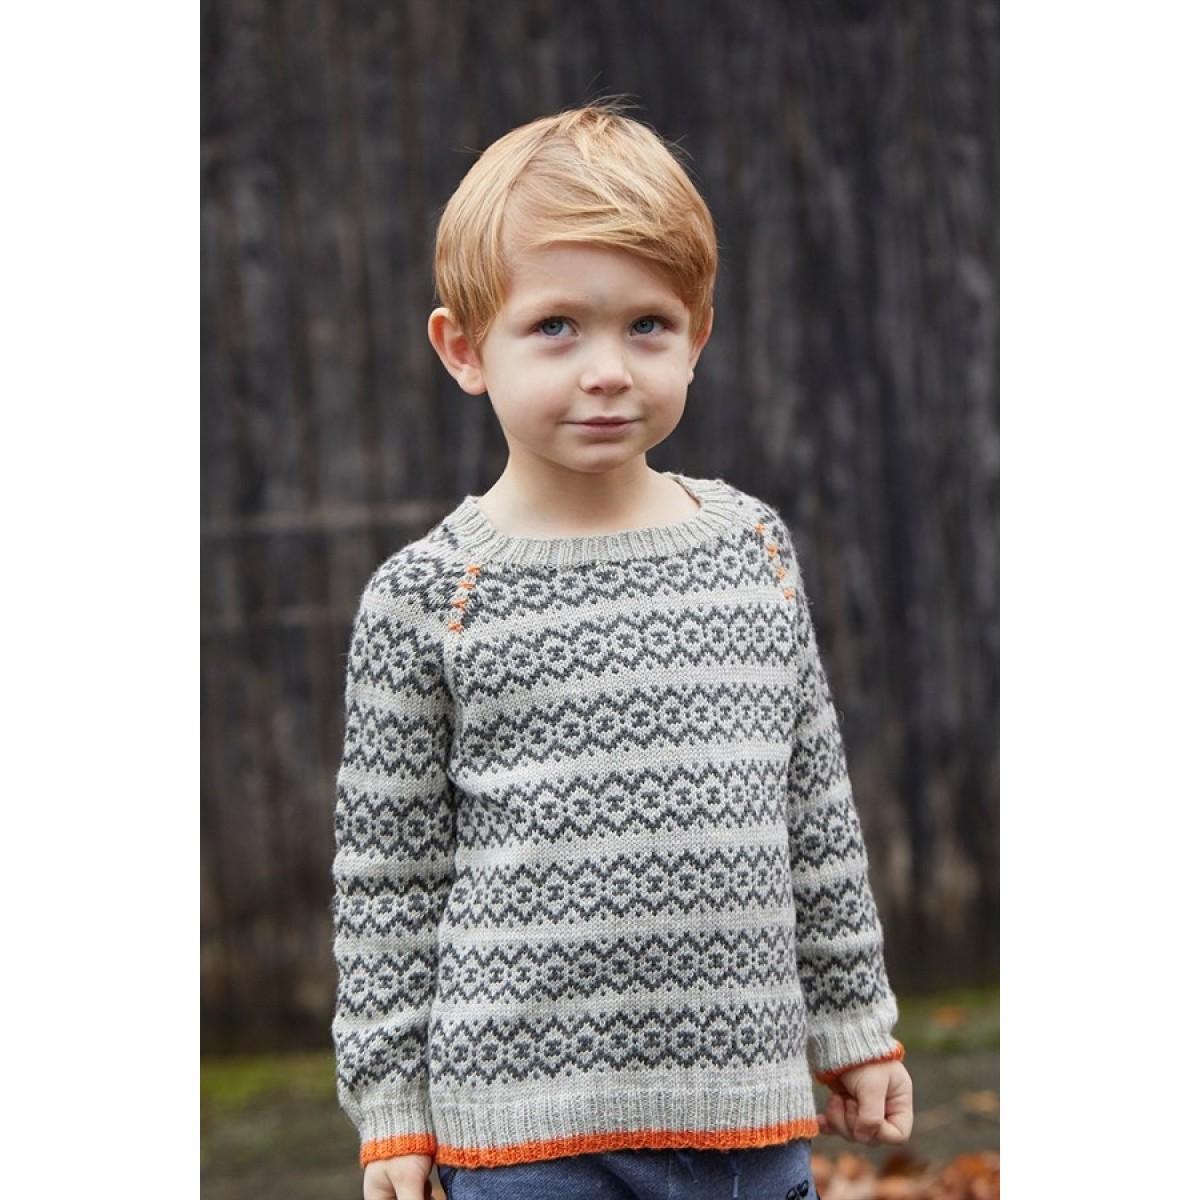 Thors sweater